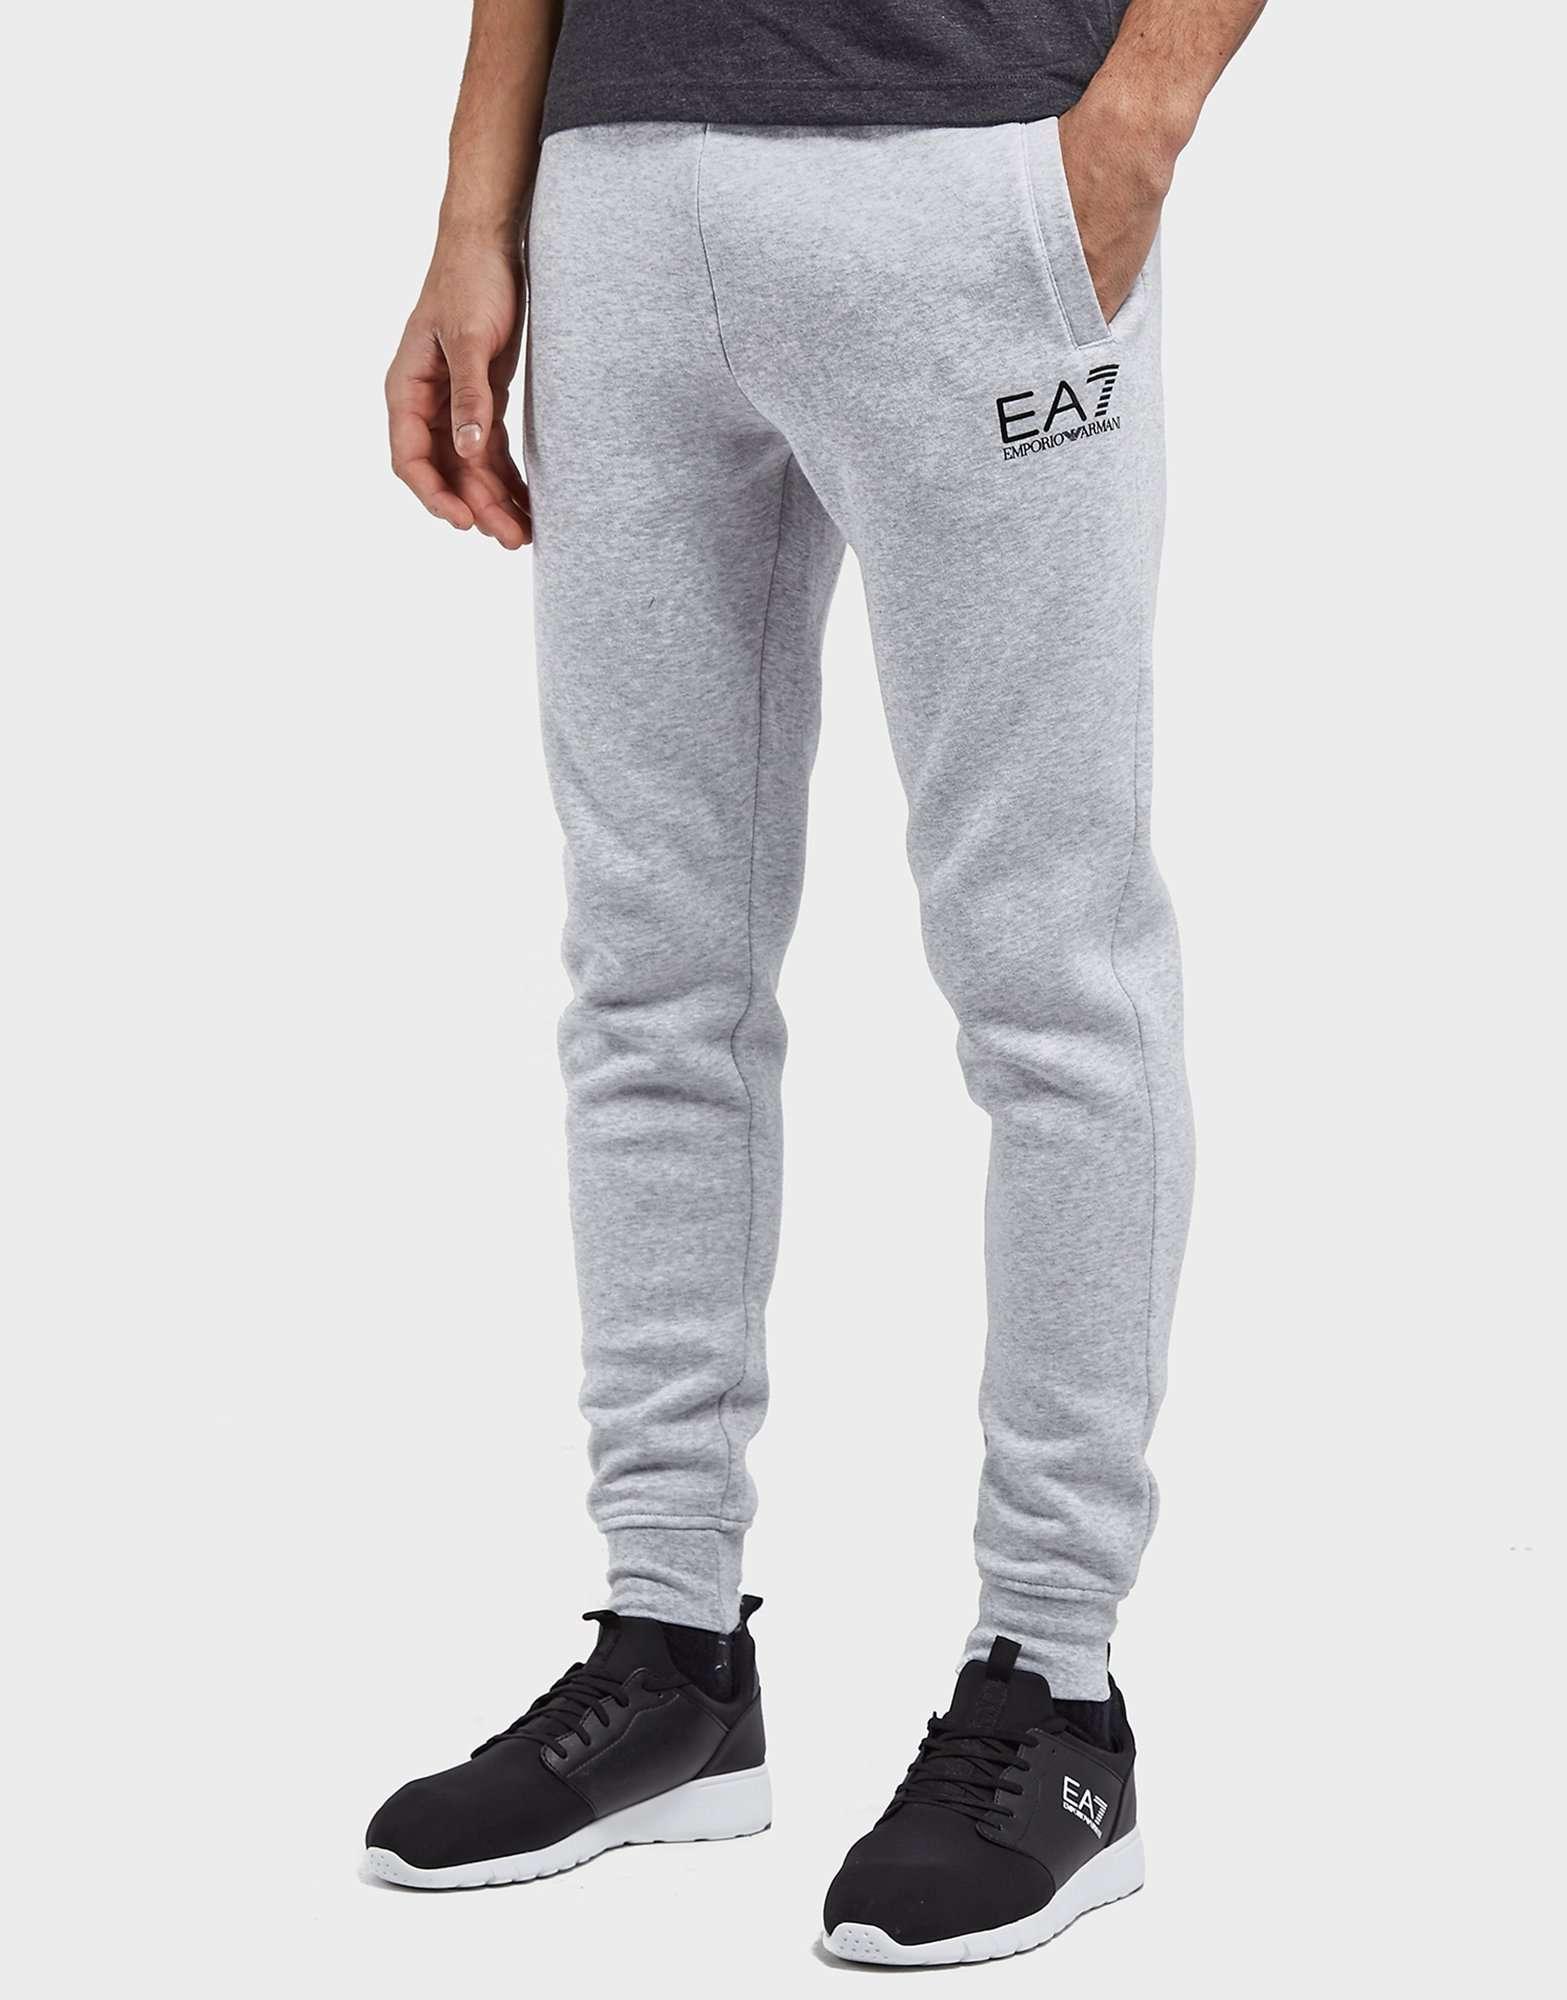 Sweatpants, Black, polyester, 2017, 10 12 14 16 8 Emporio Armani